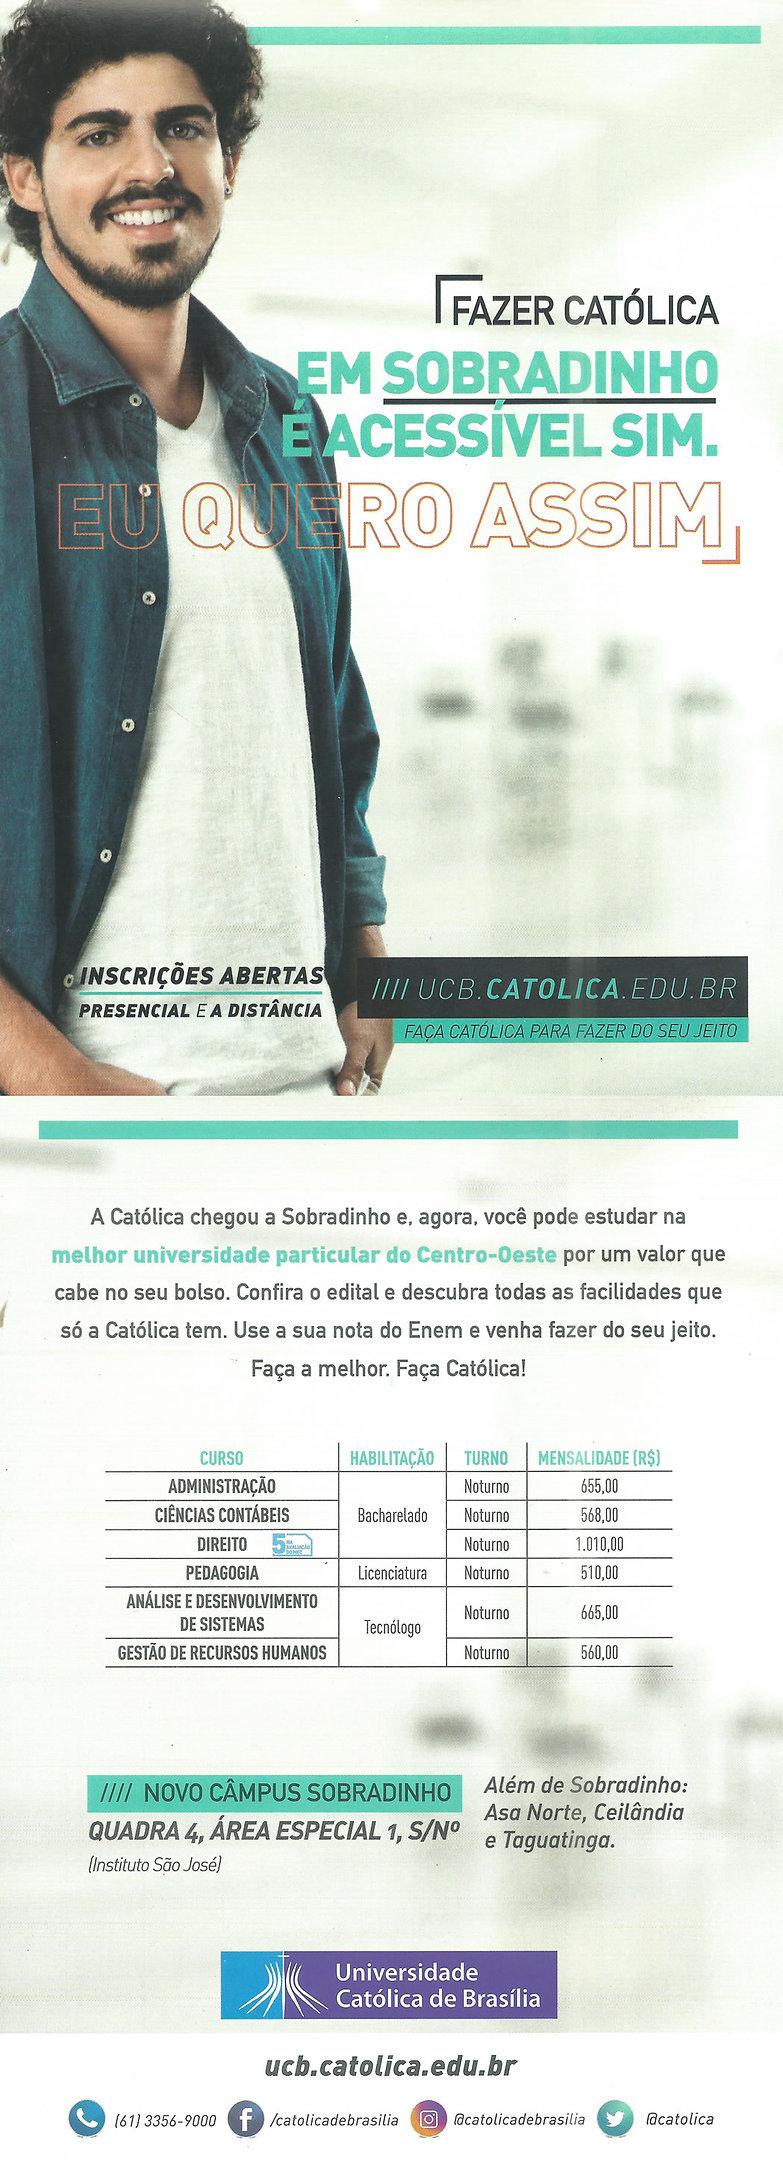 Foder_católica.jpg